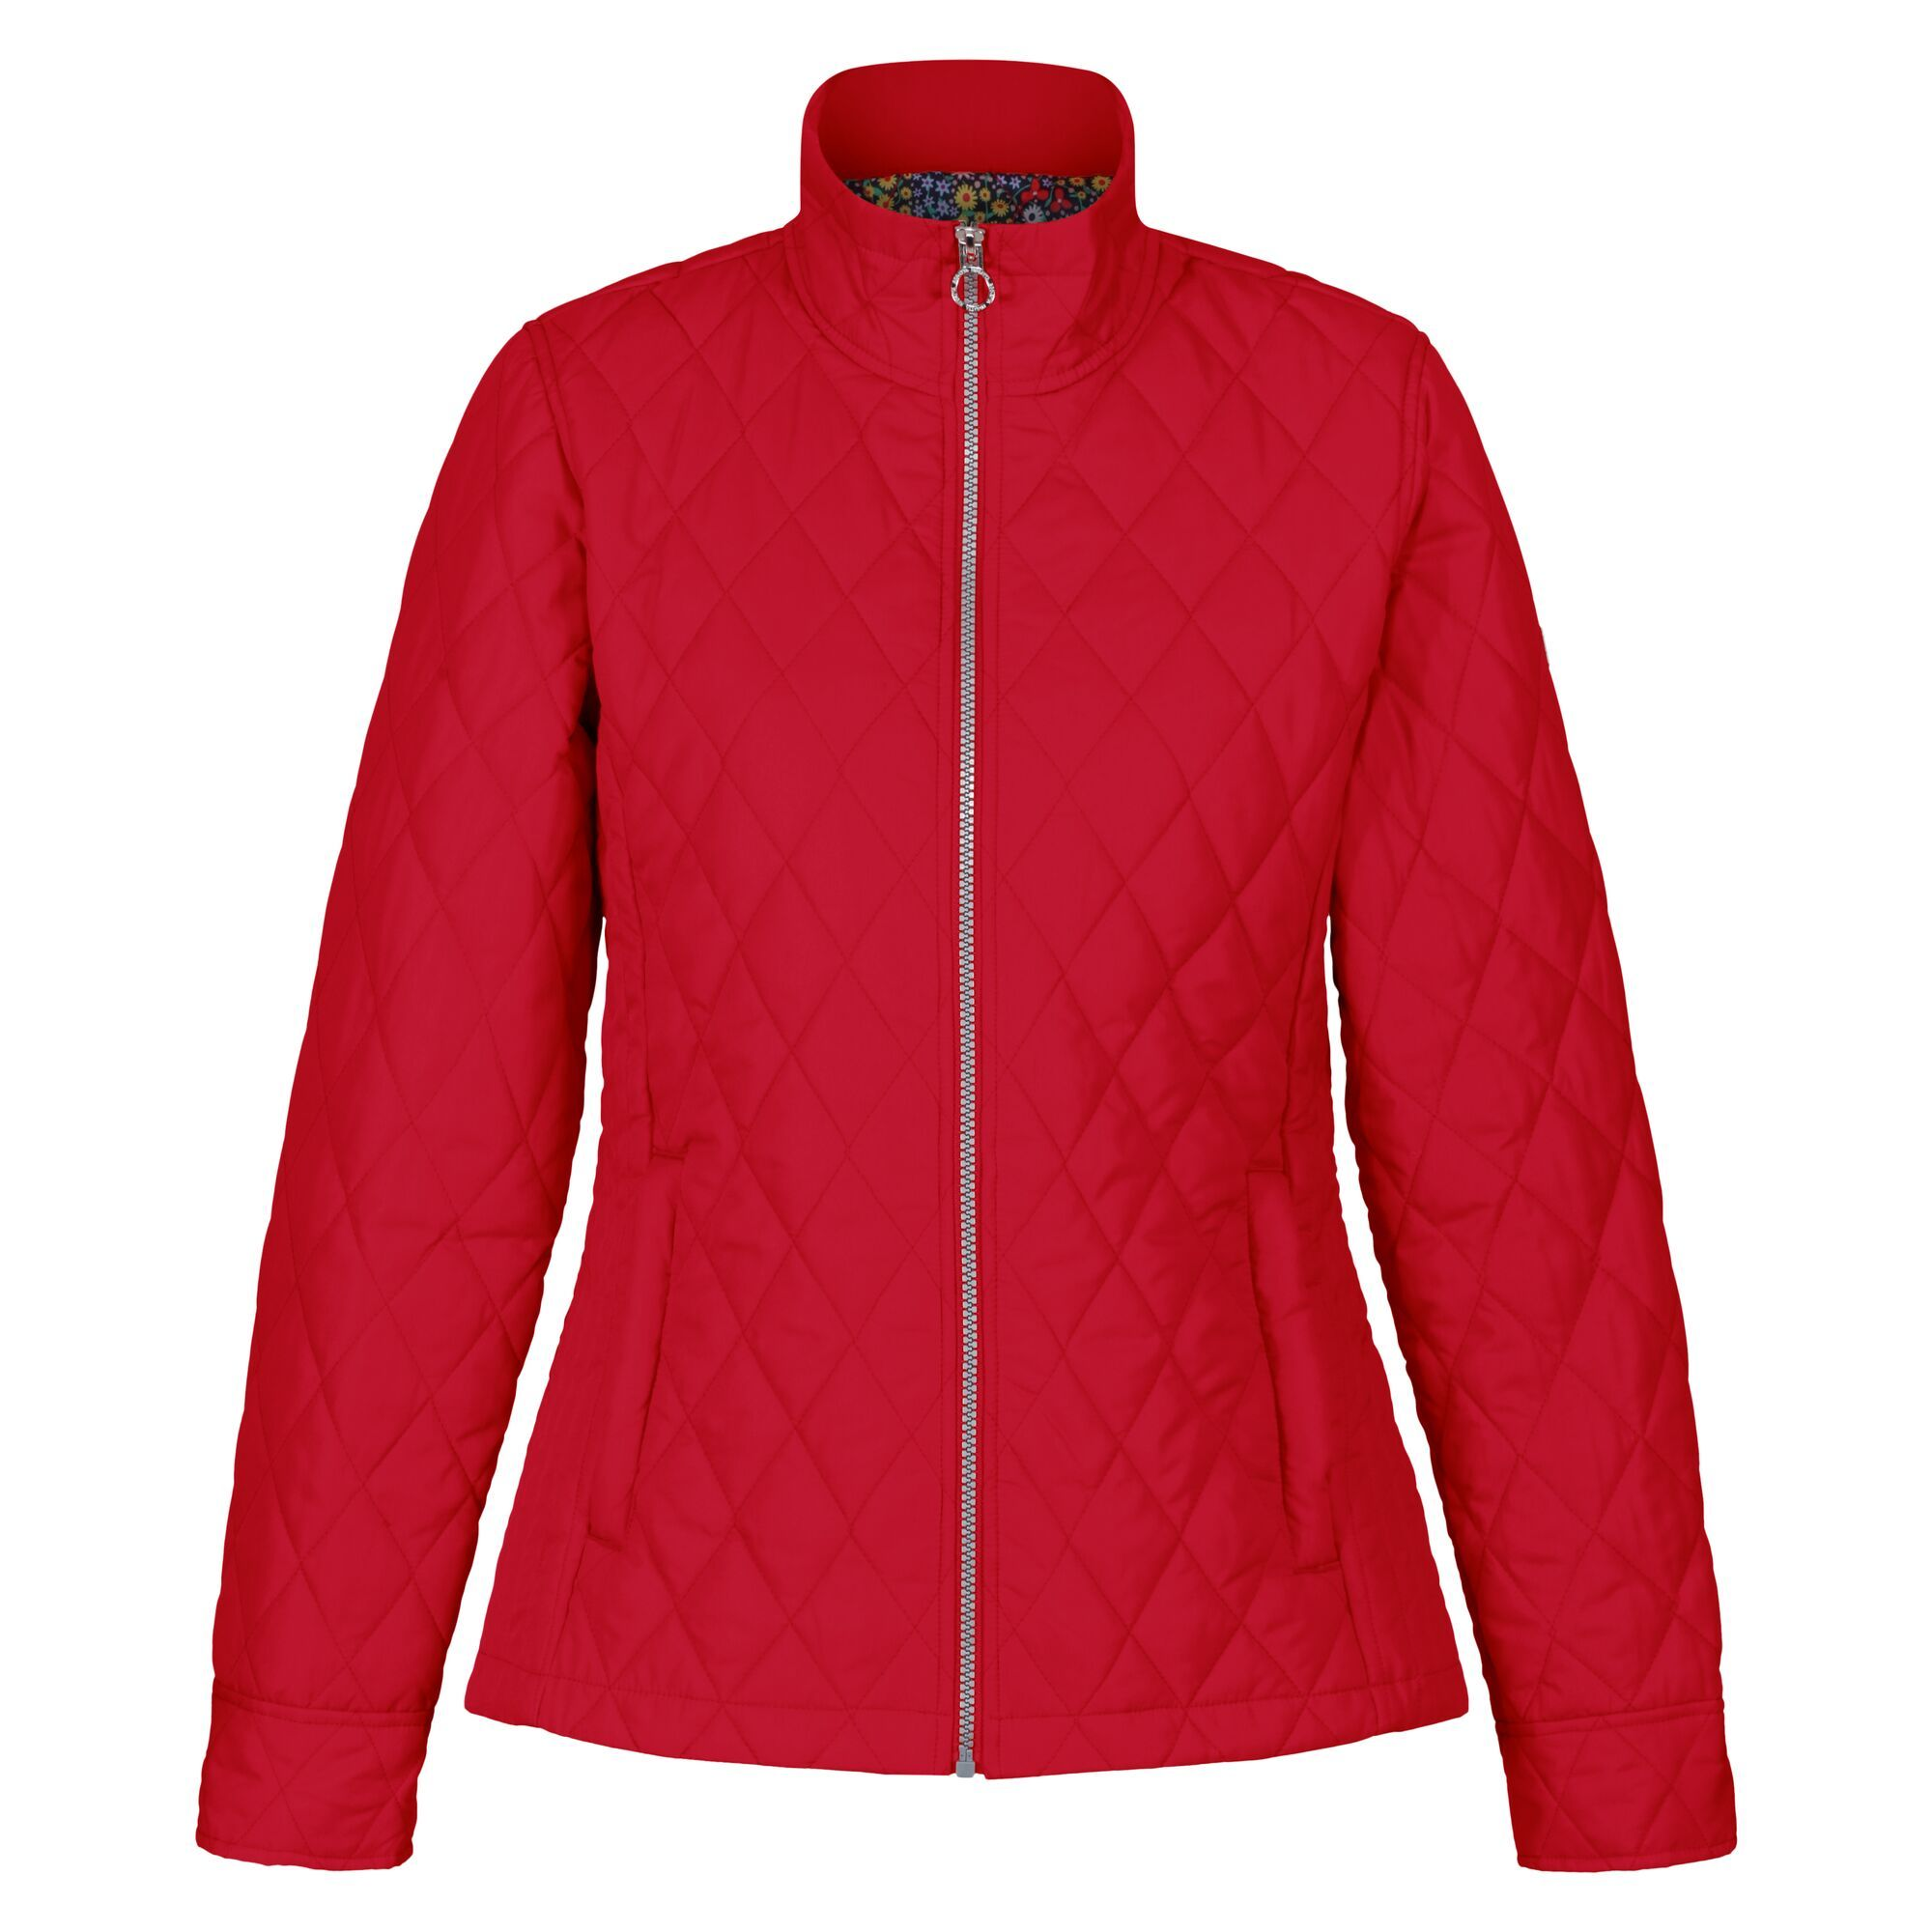 Regatta Womens/Ladies Charna Diamond Quilted Jacket (12 UK) (True Red)